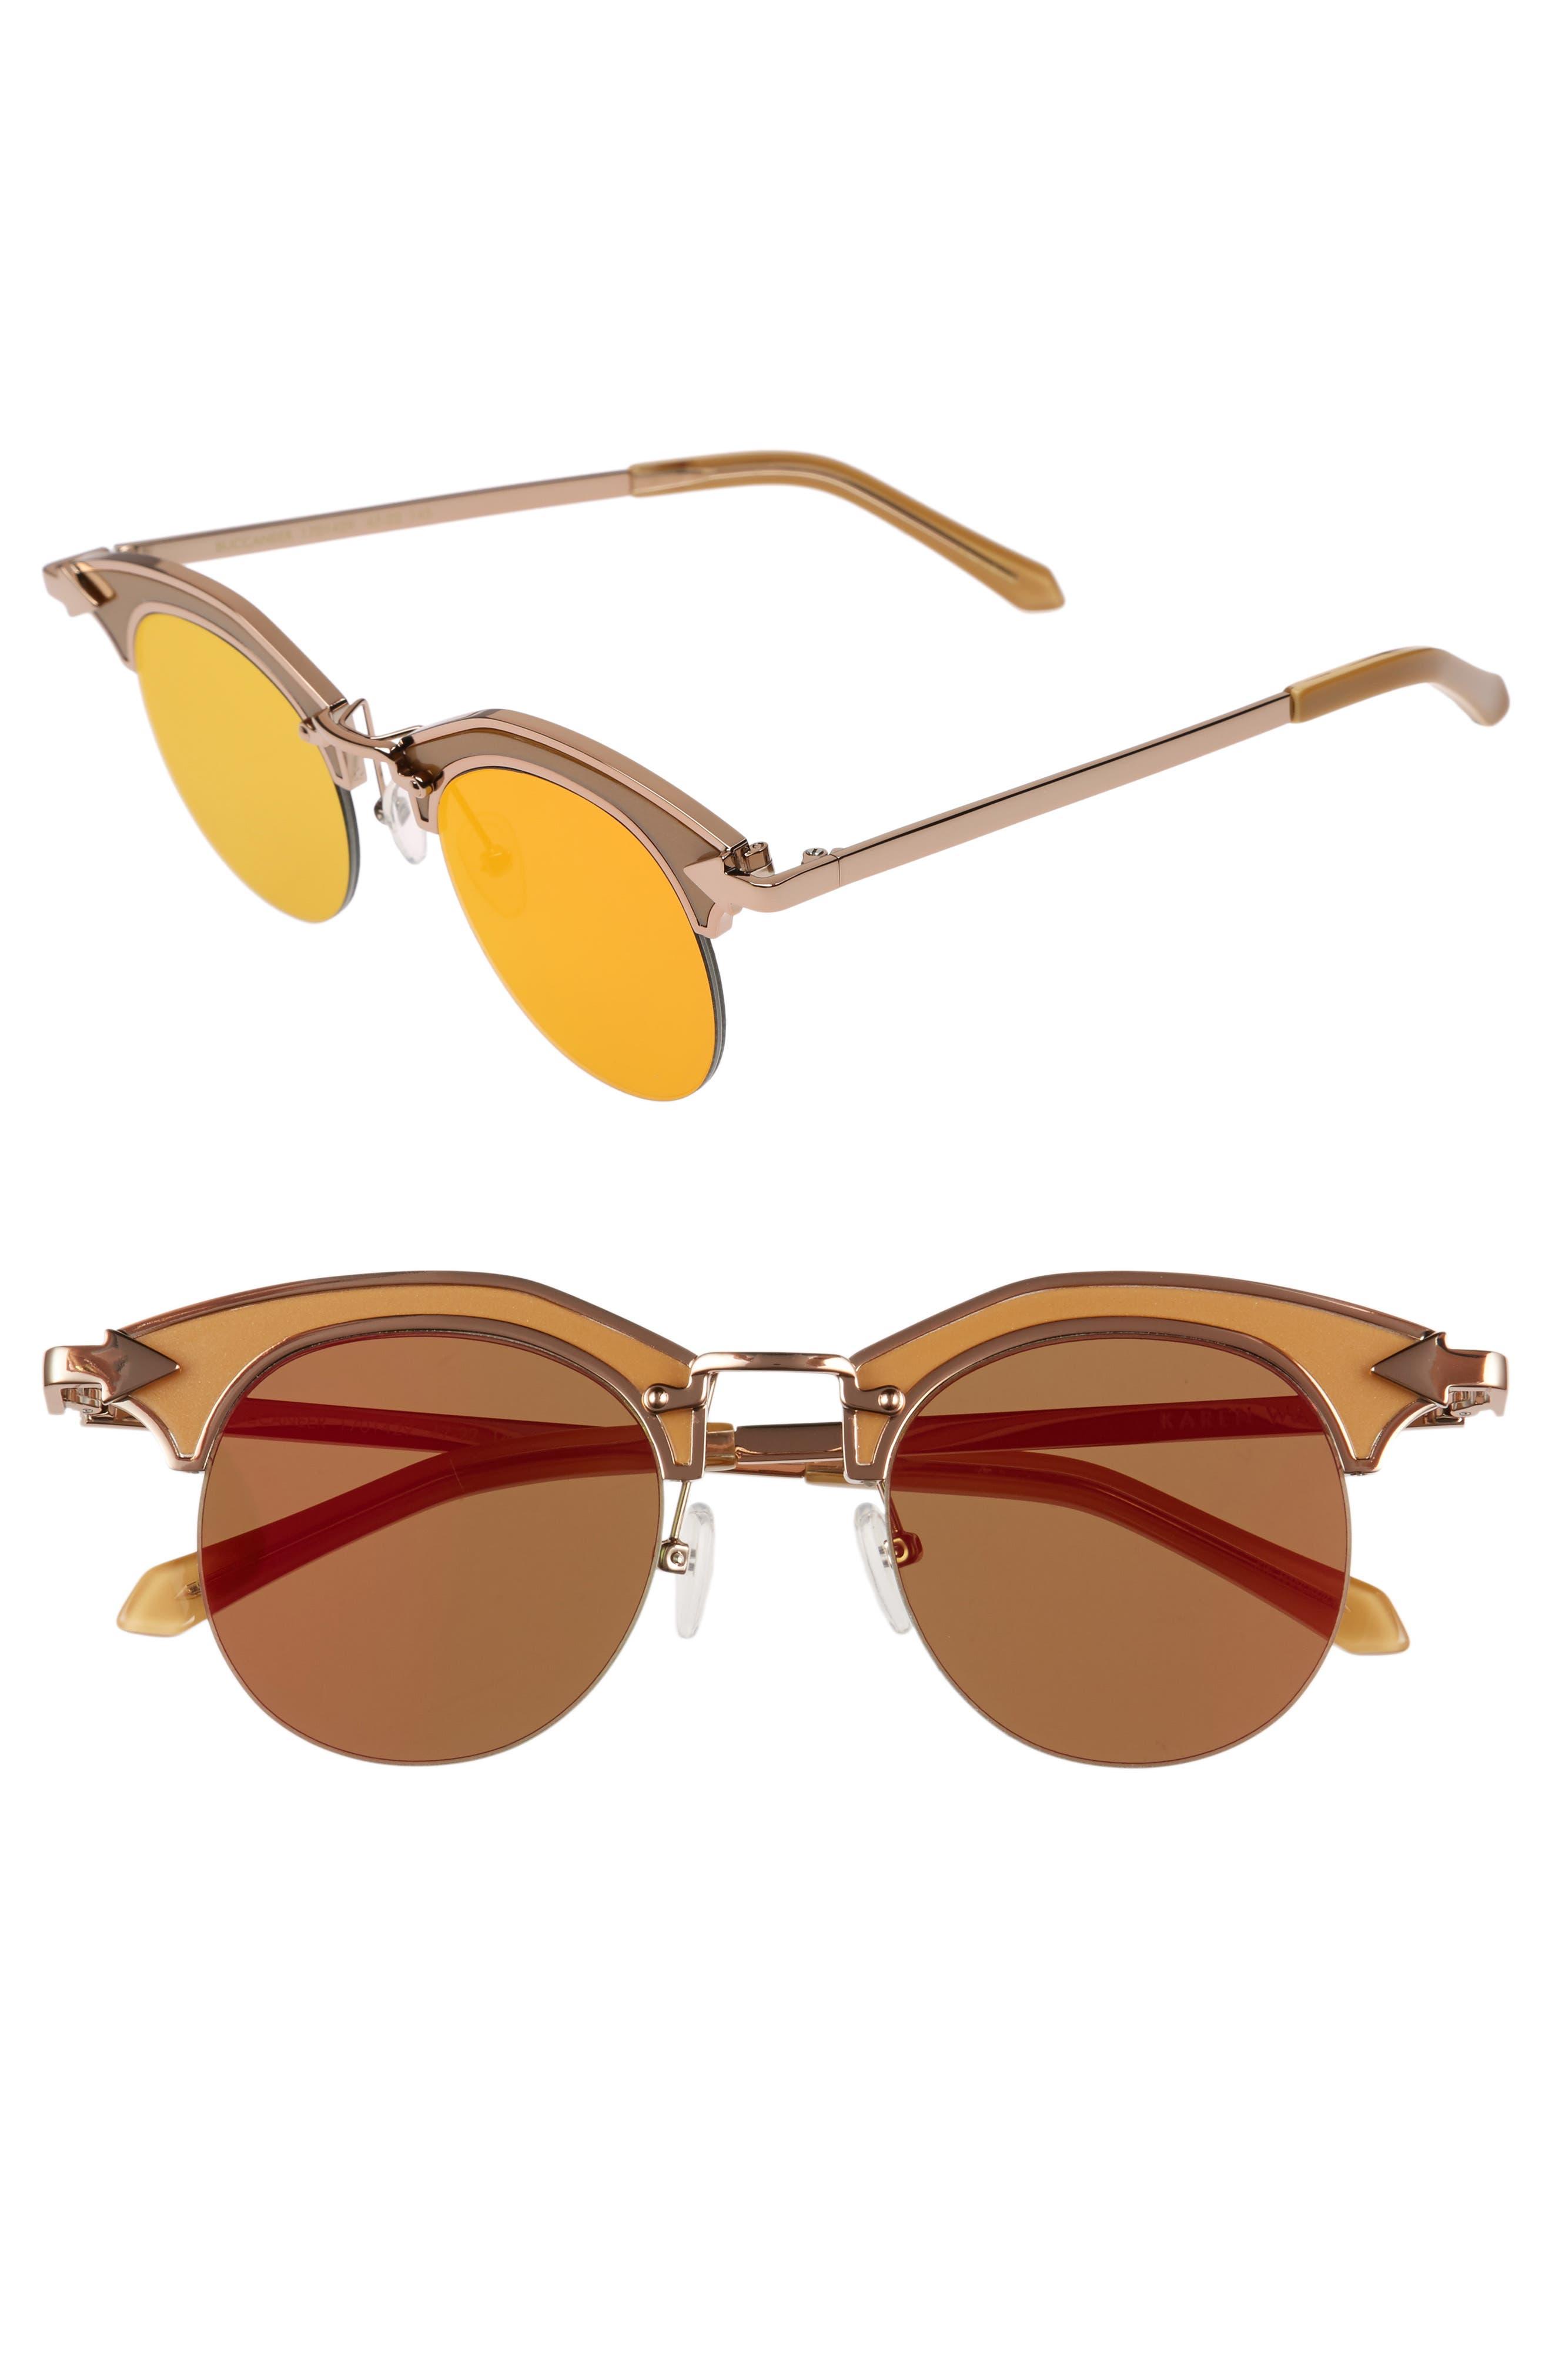 Buccaneer 47mm Round Sunglasses,                             Main thumbnail 3, color,